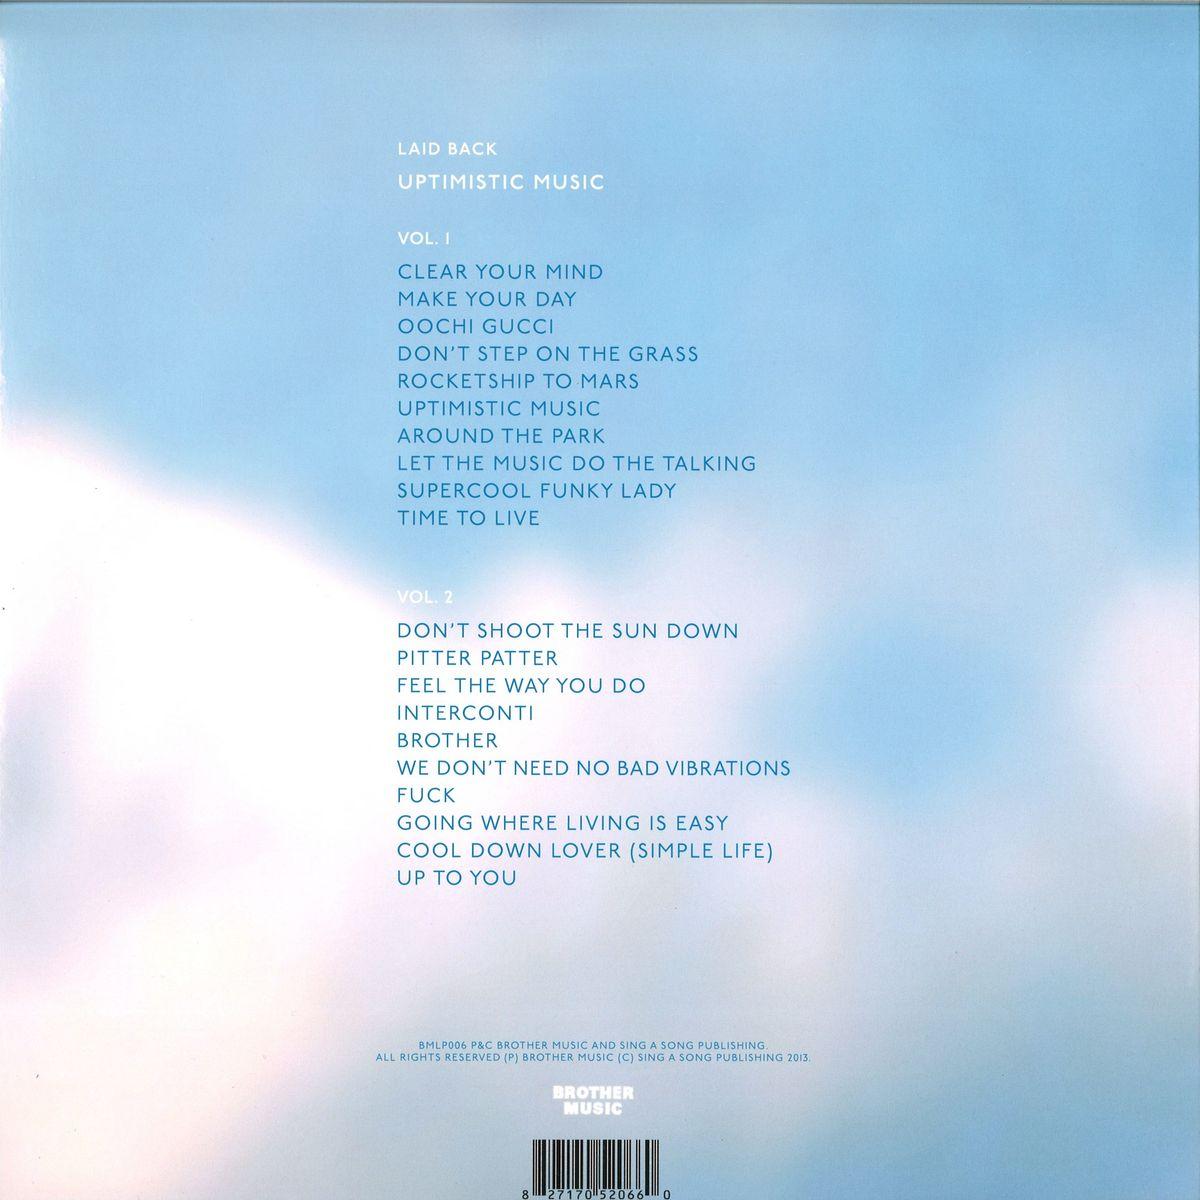 laid back - uptimistic music / brother music bmlp006 - vinyl